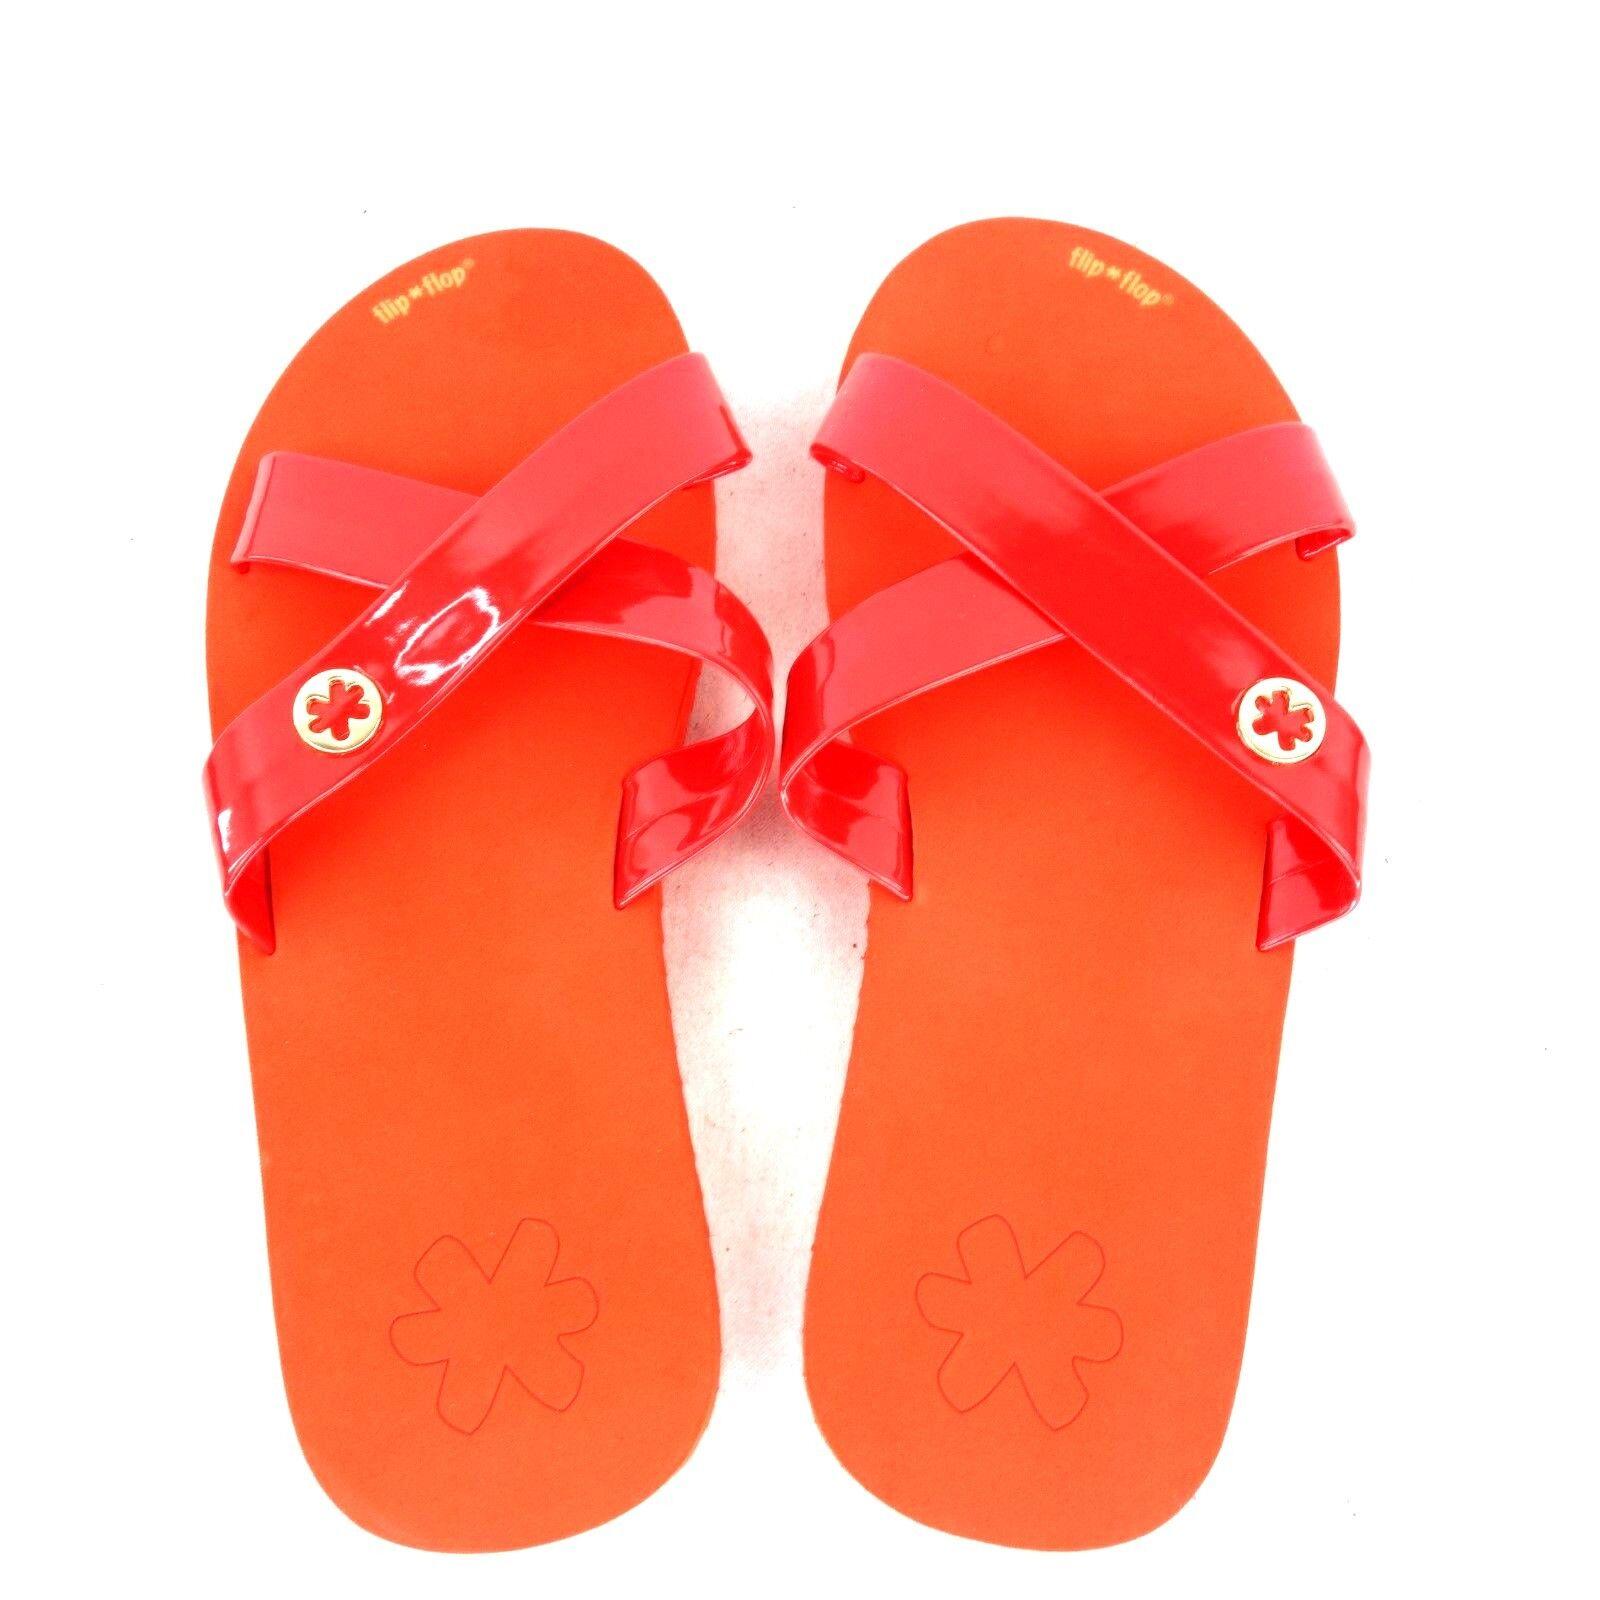 Flip Flop Women's Sandals Beach shoes Size 41 Red Summer Beach shoes Np 29